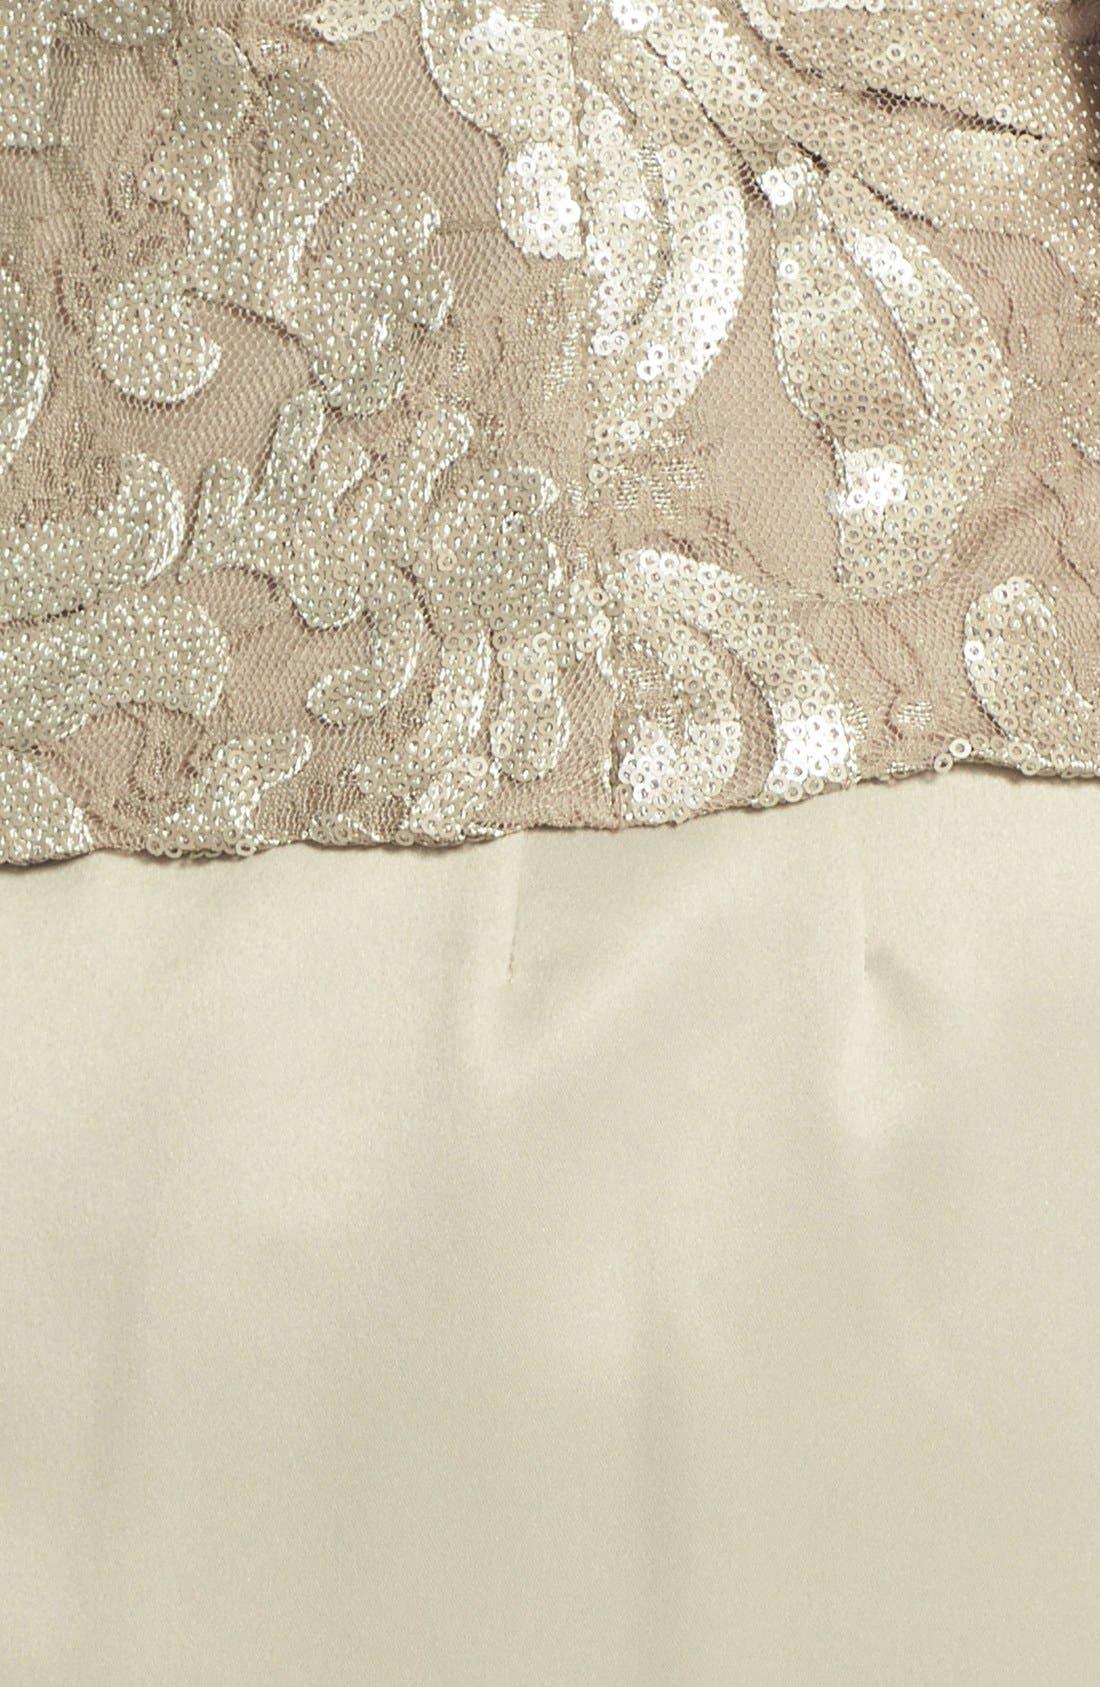 Alternate Image 3  - Alex Evenings Embellished Chiffon Gown & Jacket (Plus Size)